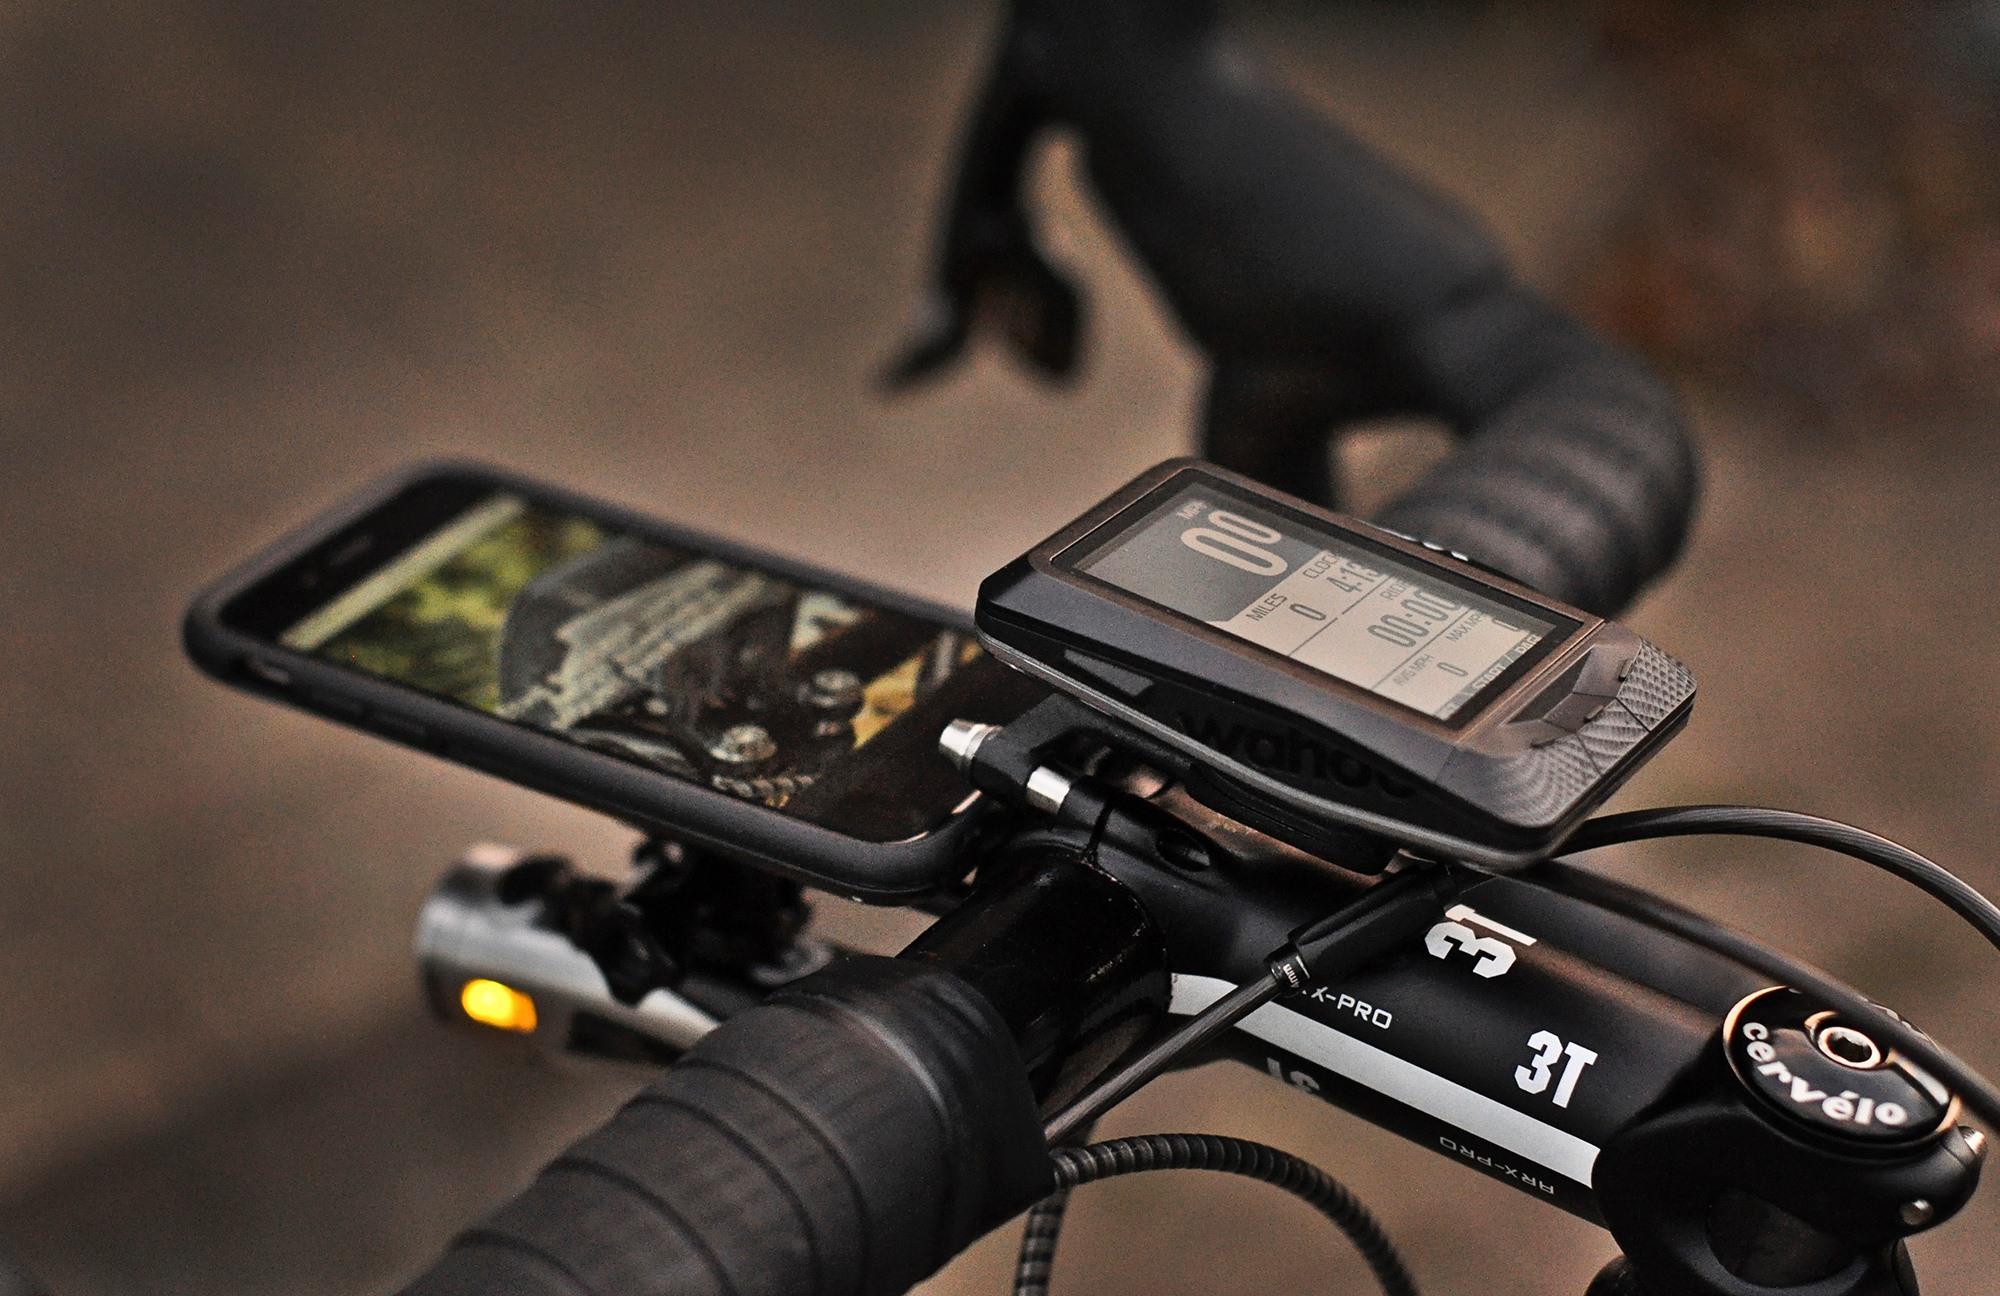 mounted bike computer